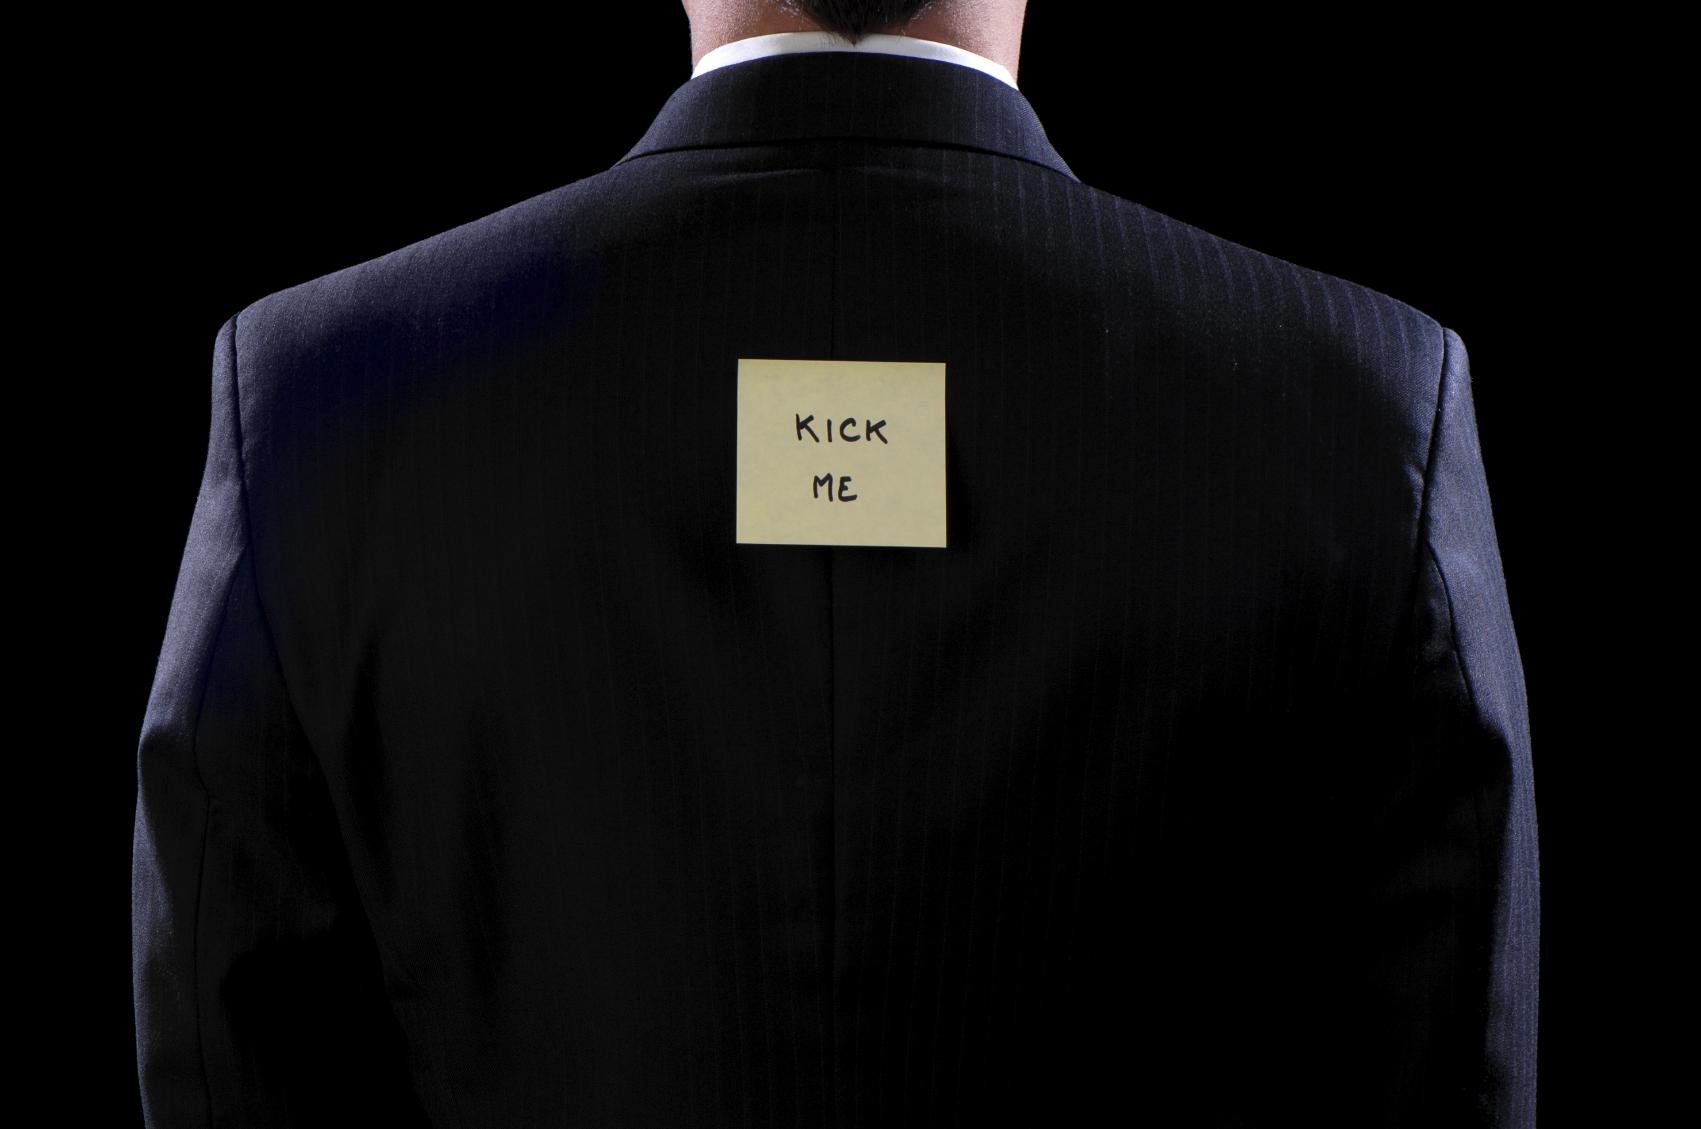 A businessman with a Kick Me sign